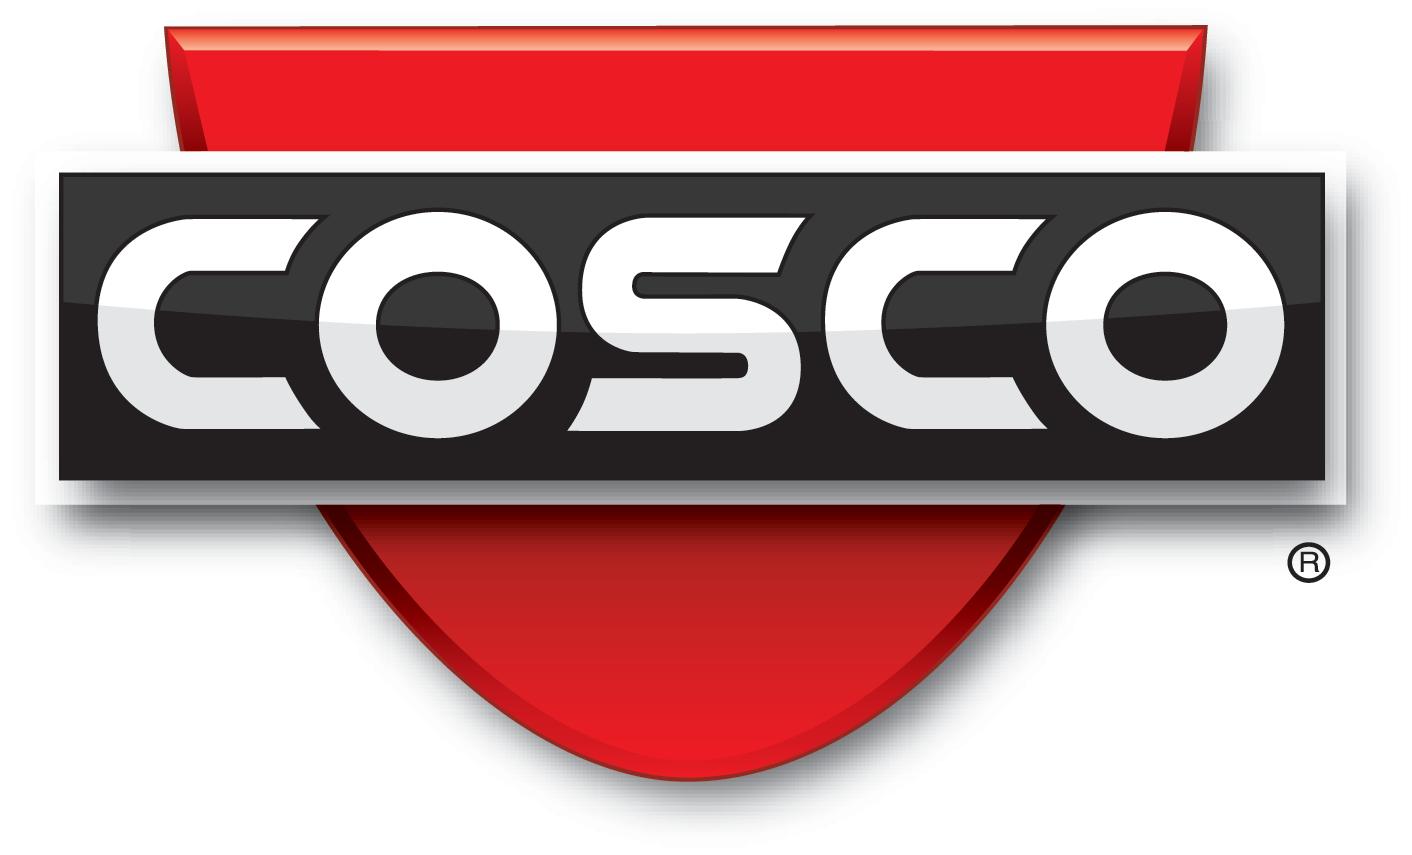 Mbns18_Cosco Full Color Logo